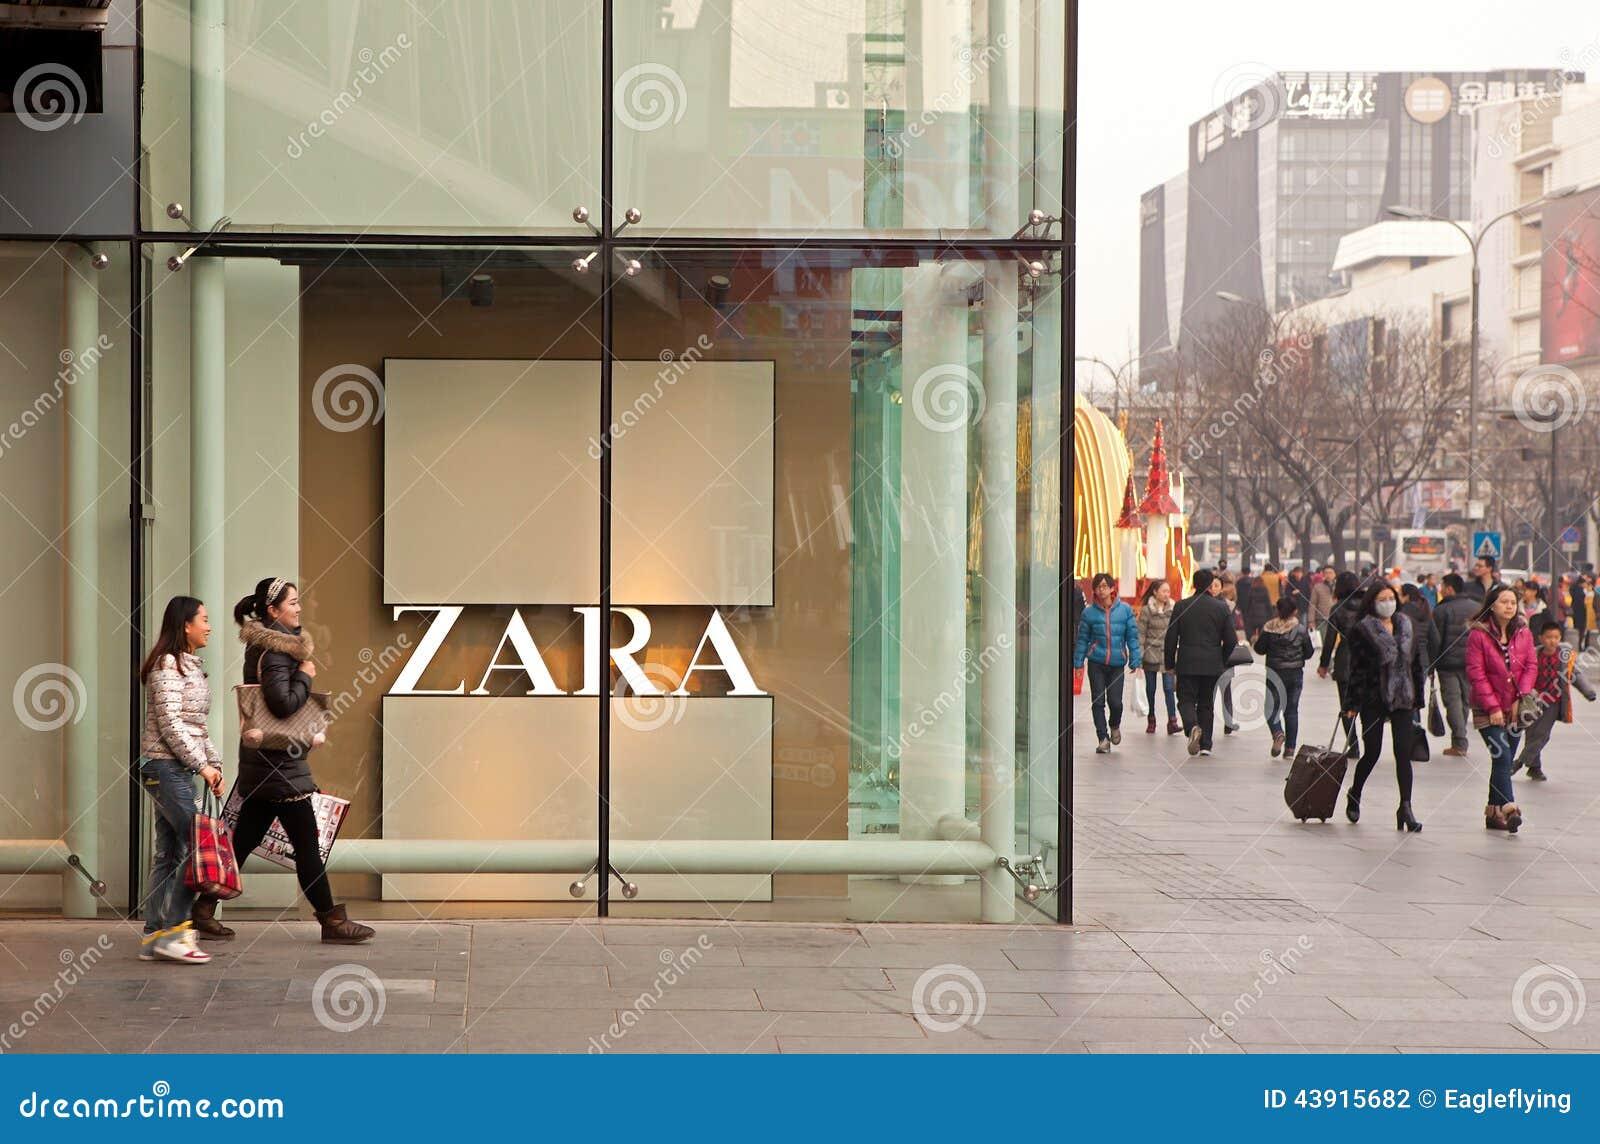 BEIJING, CHINA - JANUARY 2, 2014: People is seen around a Zara store